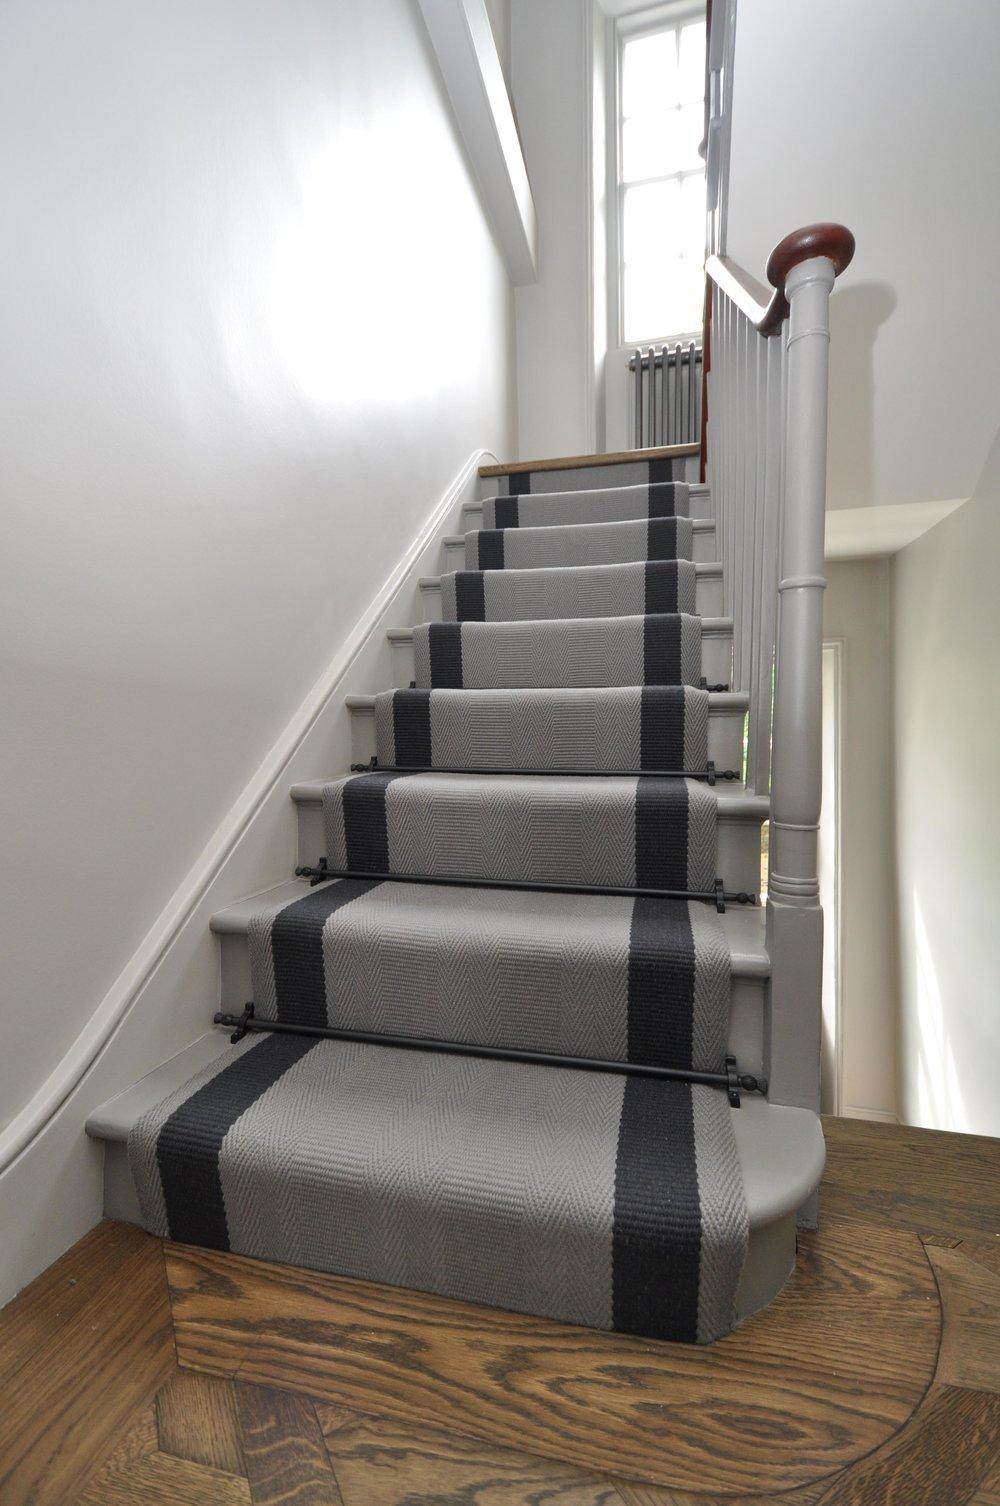 flatweave-stair-runner-london-bowloom-off-the-loom-geometric-carpet-DSC_1123.jpg